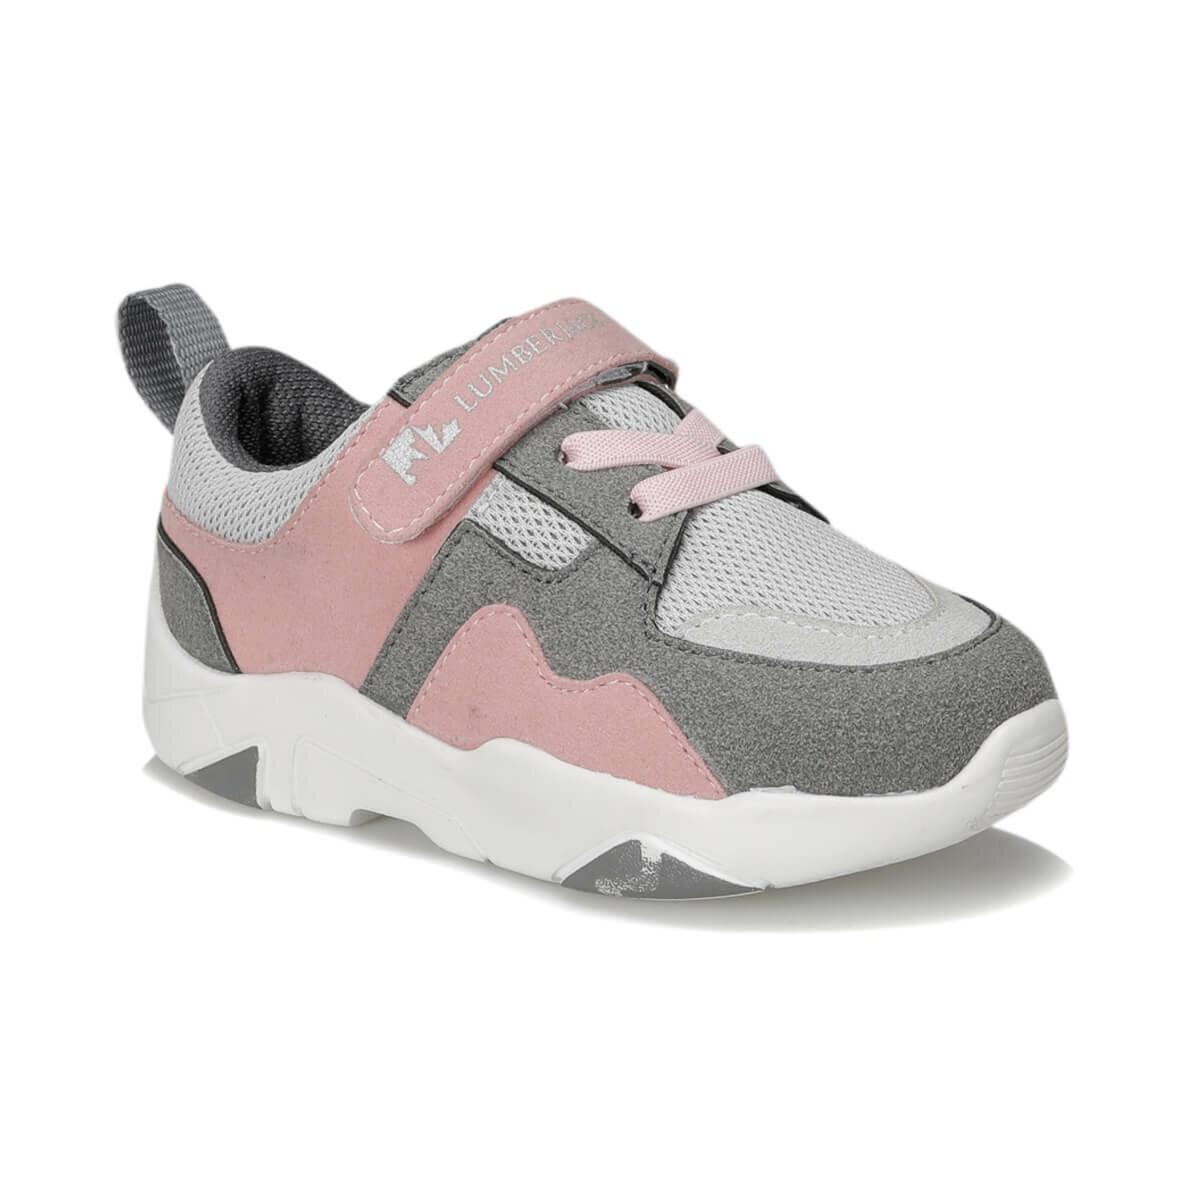 FLO SENSE 9PR Dark Gray Female Child Walking Shoes LUMBERJACK